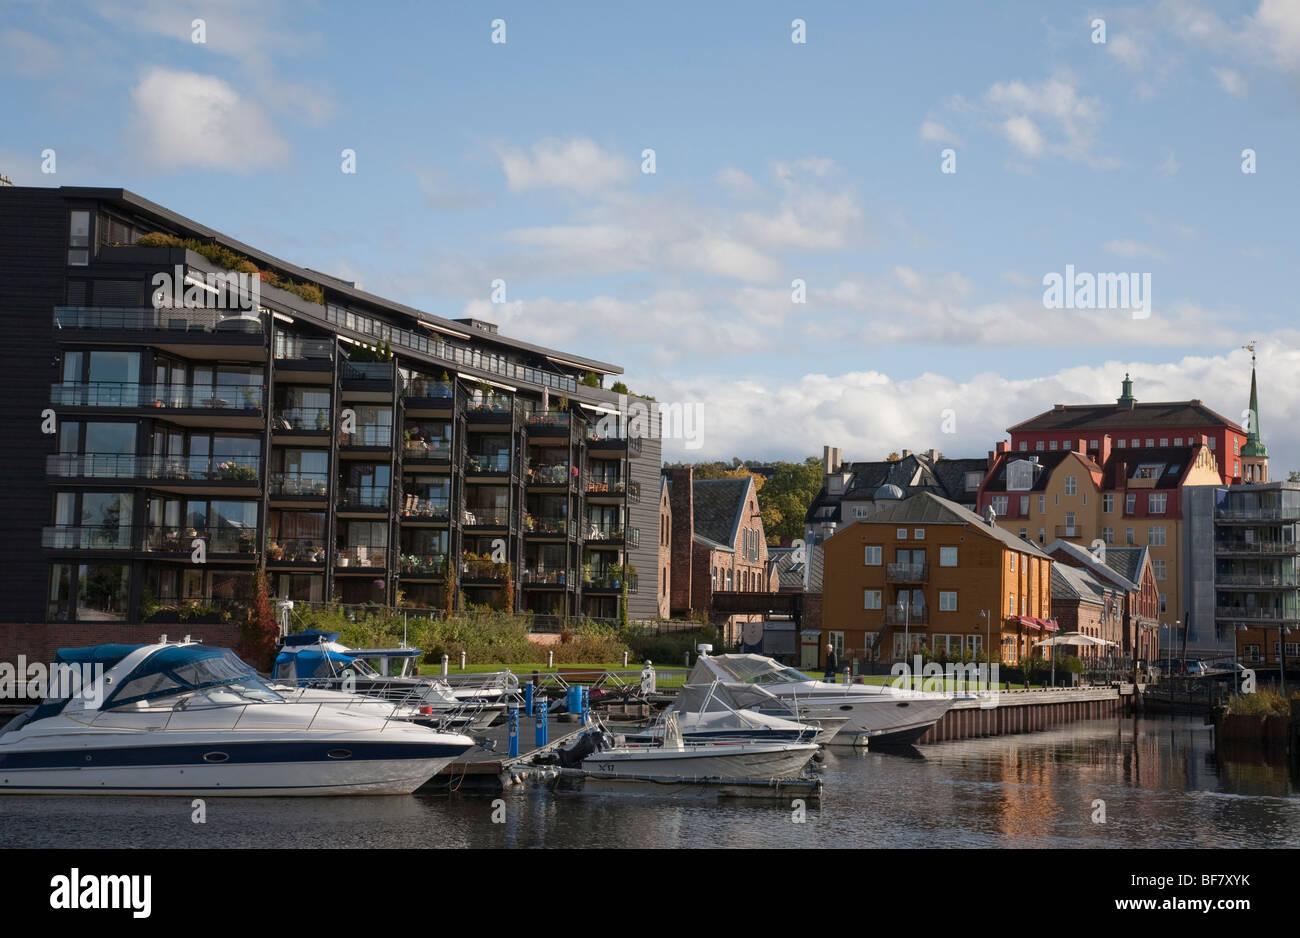 Noruega Trondheim Baklandet Bryggen arquitectura moderno puente Imagen De Stock